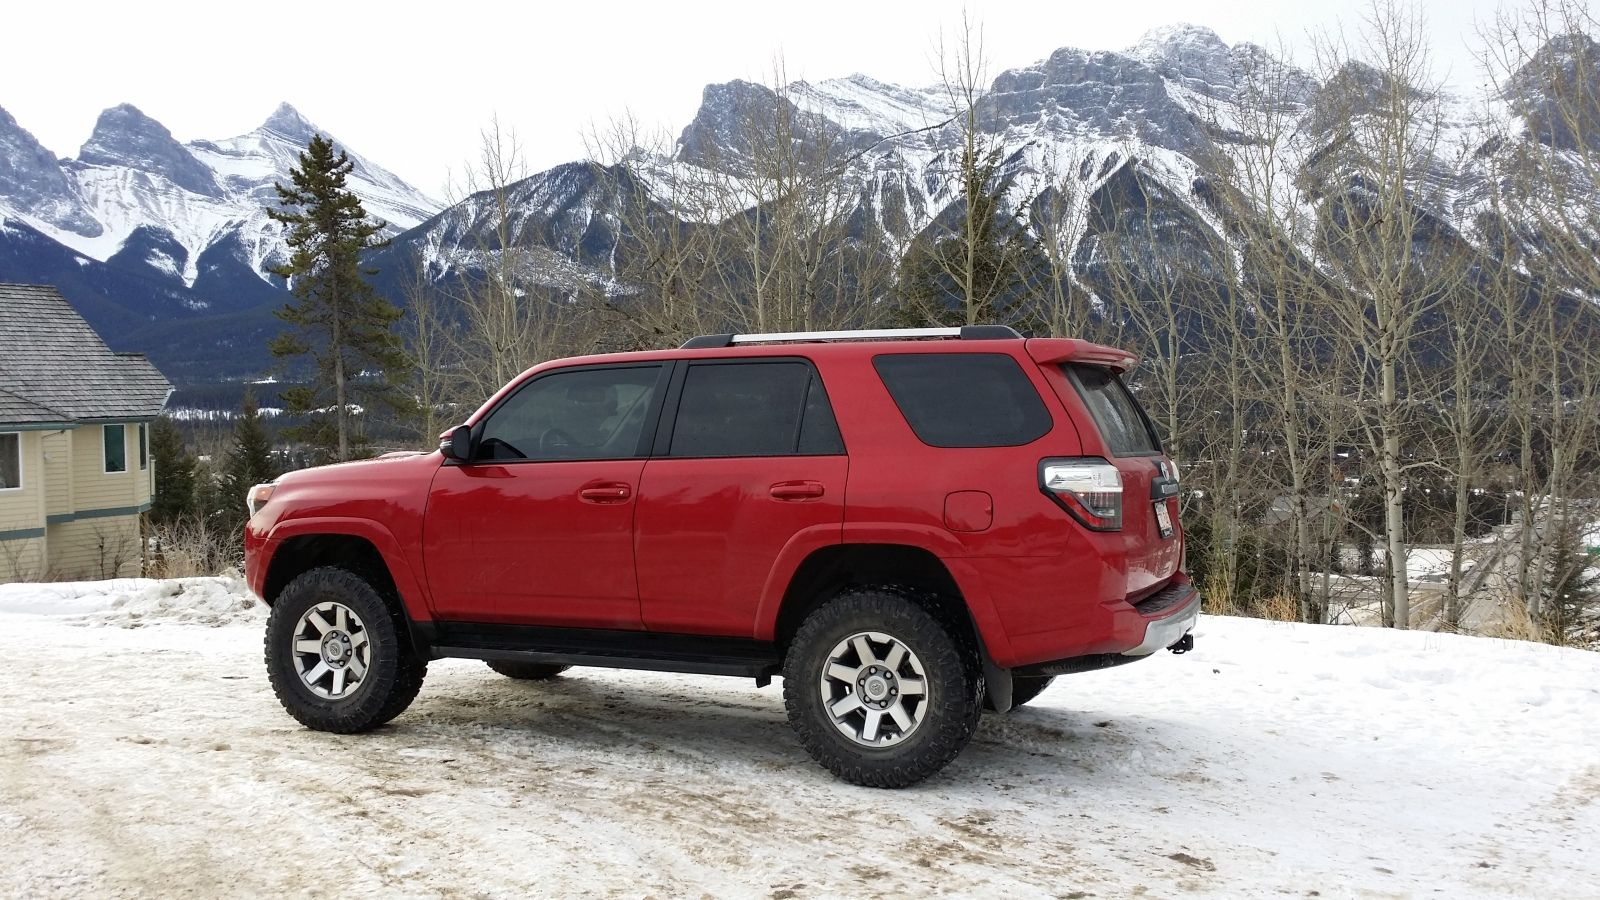 Best Year 4runner >> Revtek 3 Lift Kit 285 70 R17 Good Year Duratrac Toyota